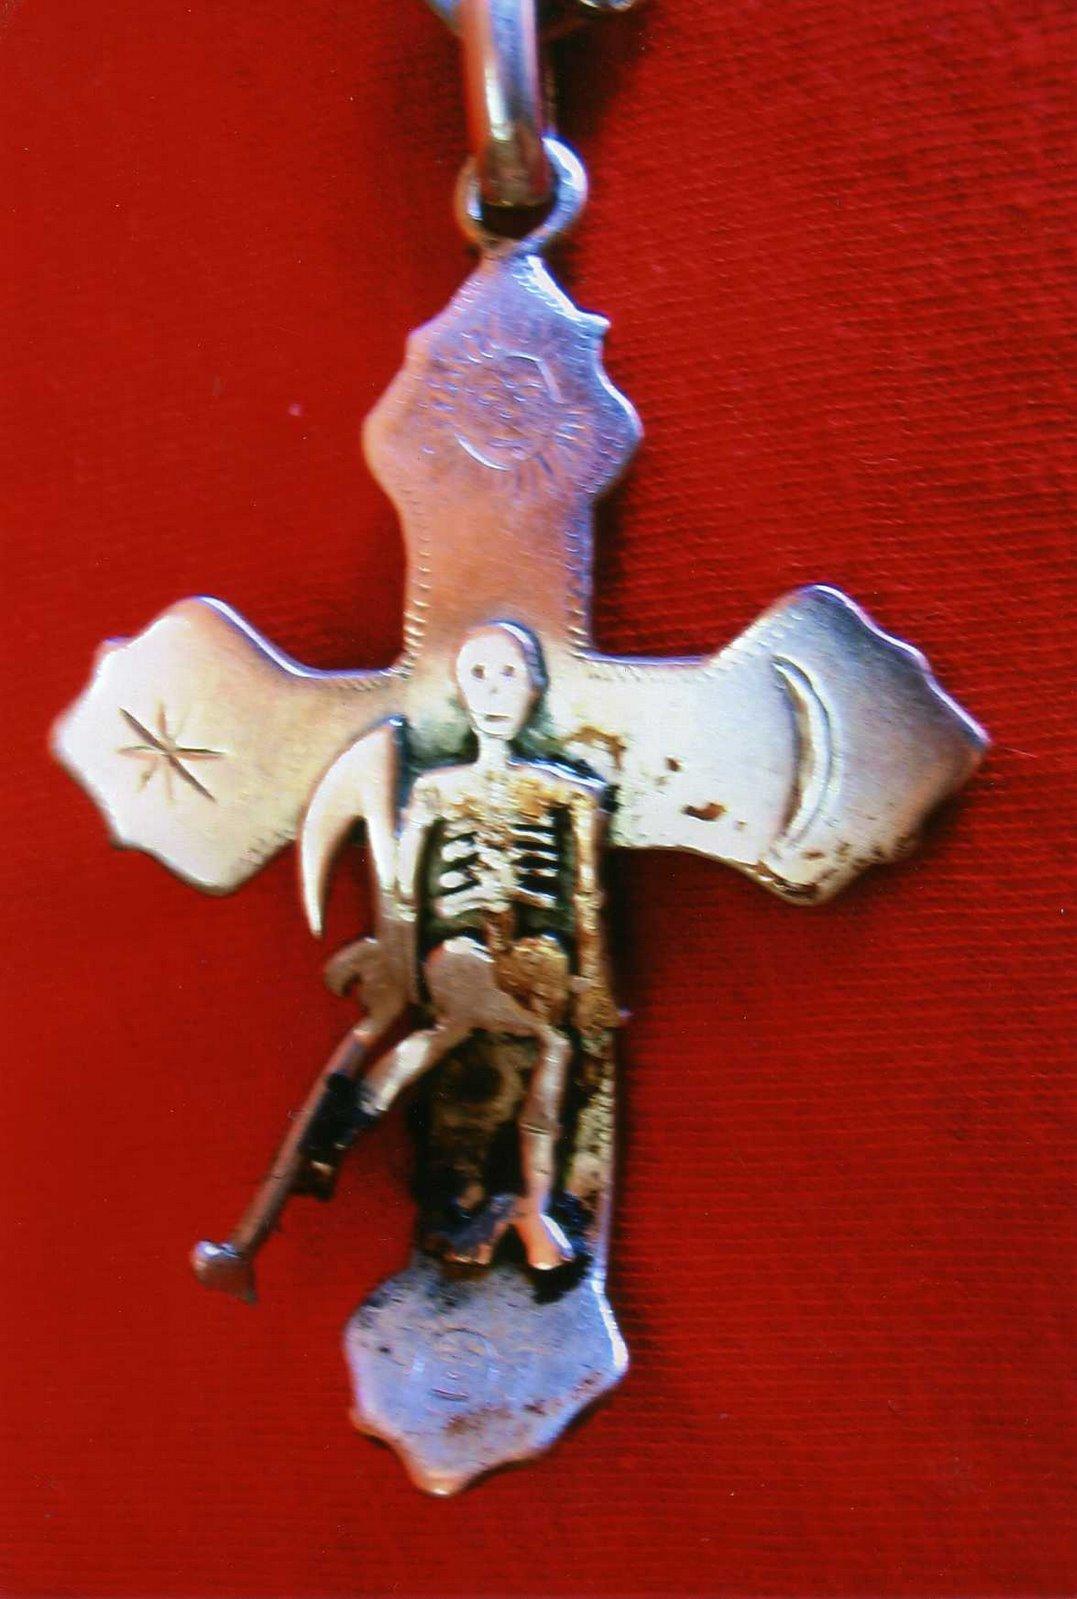 Un La De En Muerte Rosario Tatuajes Santa